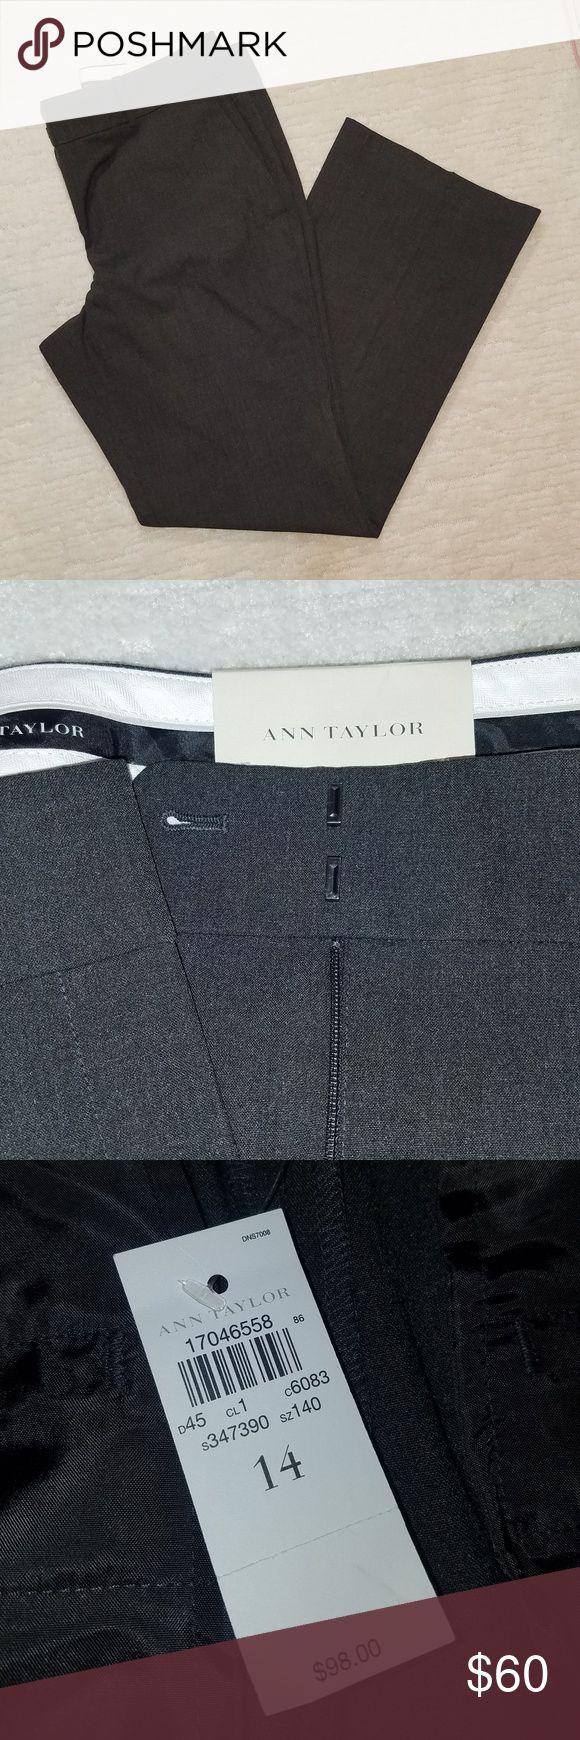 NWT Ann Taylor dark grey dress pants. Size 14 Ann…